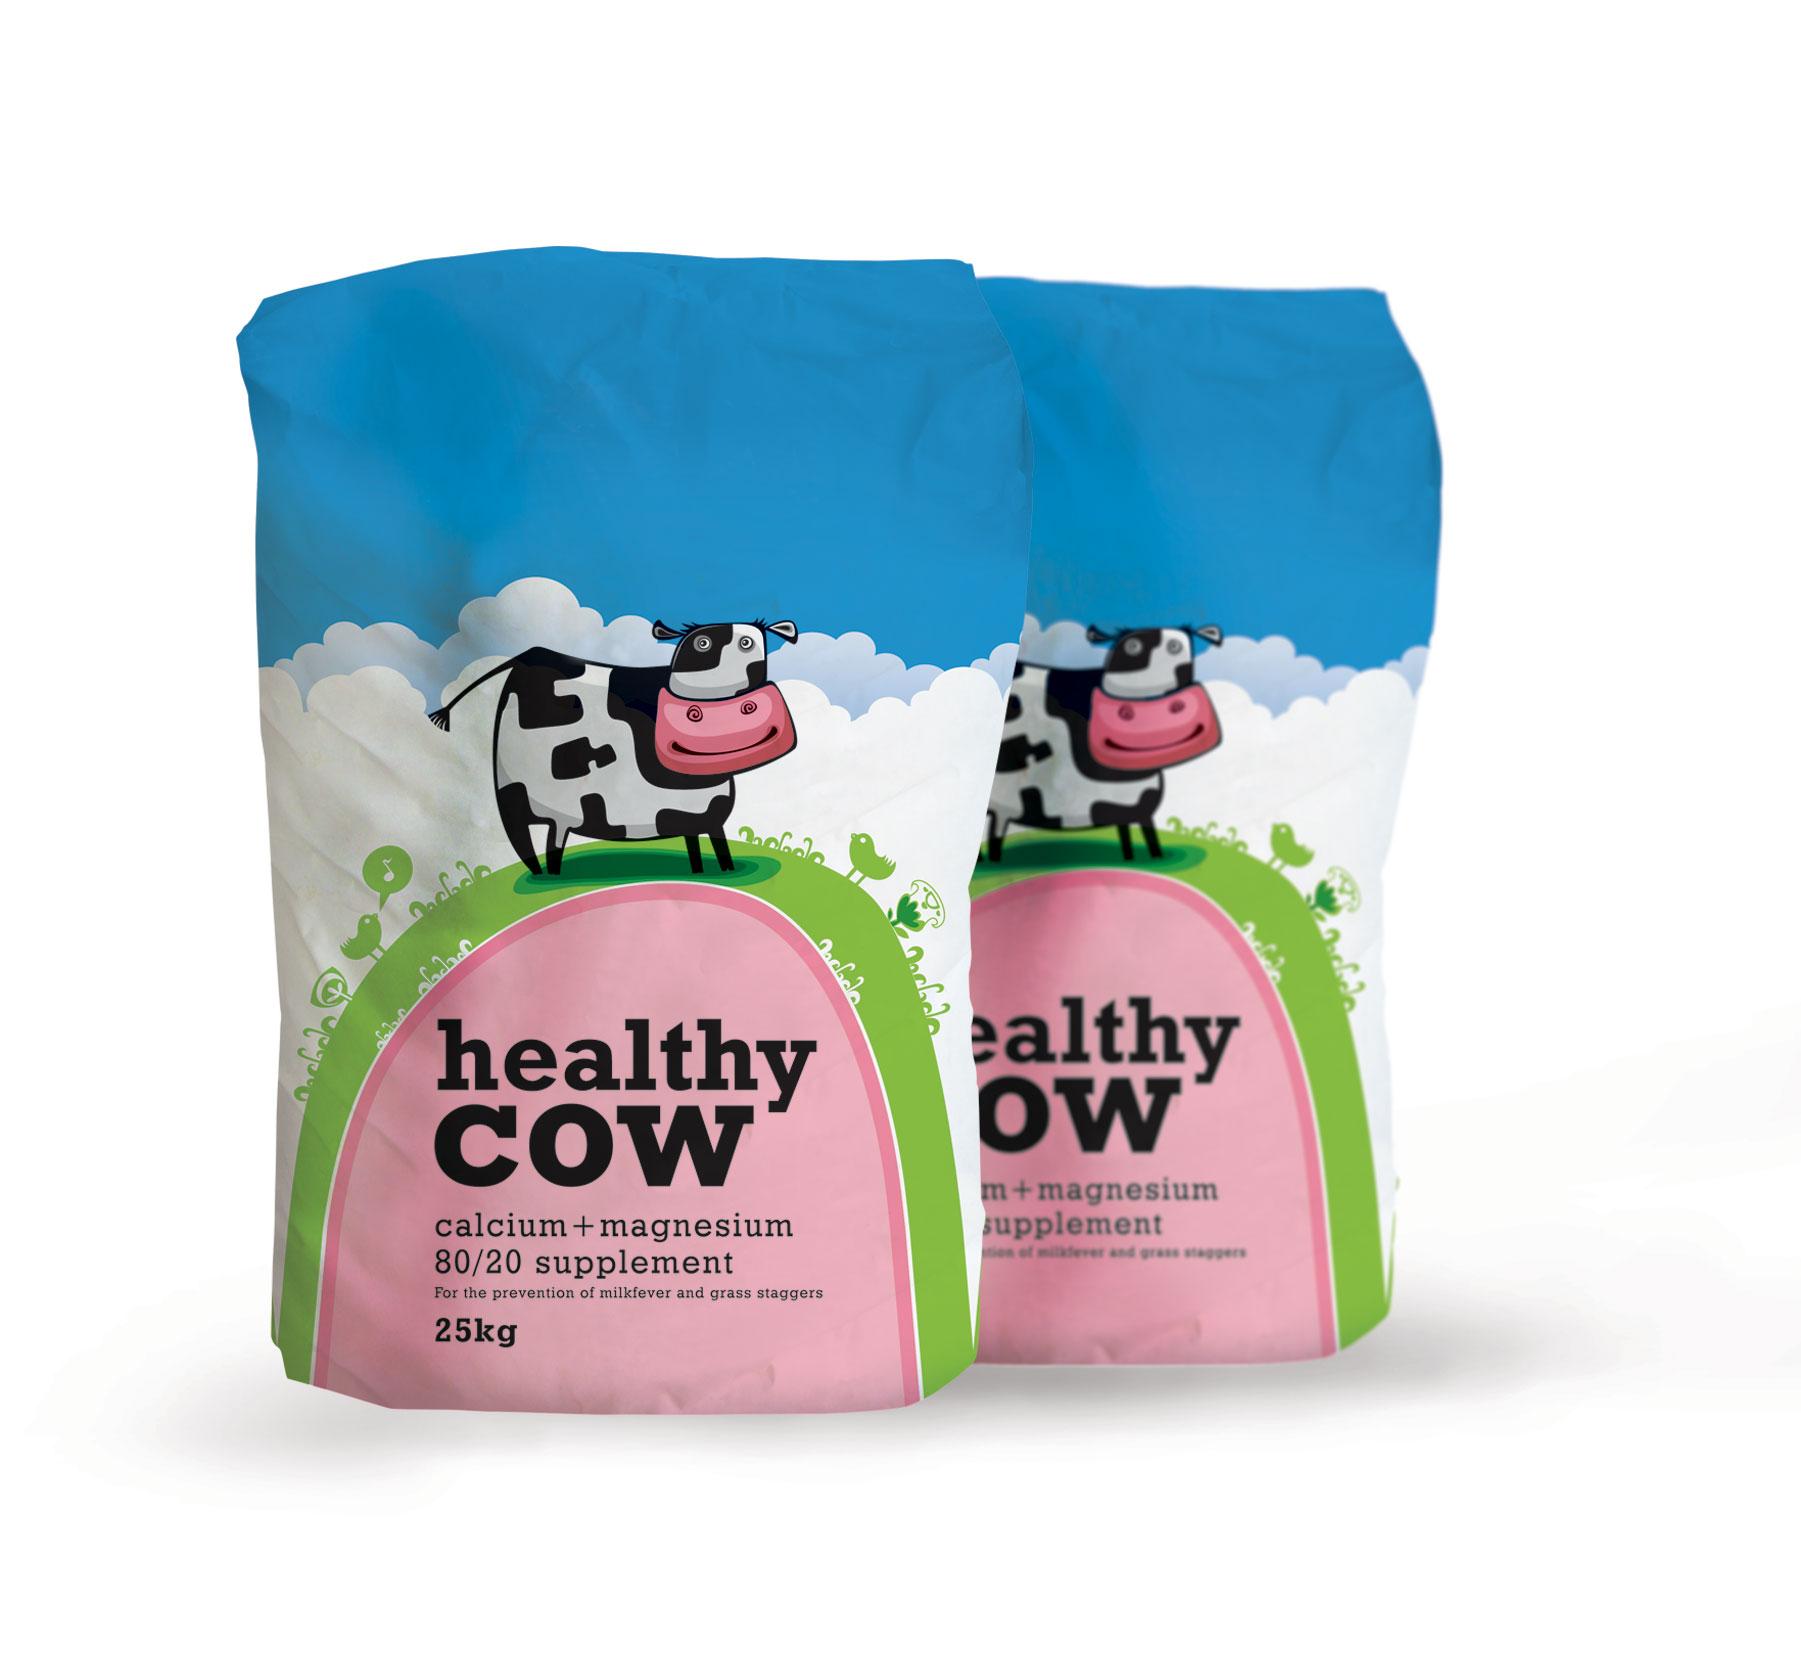 Healthy-Cow-Calcium-Magnesium_Supplement.jpg